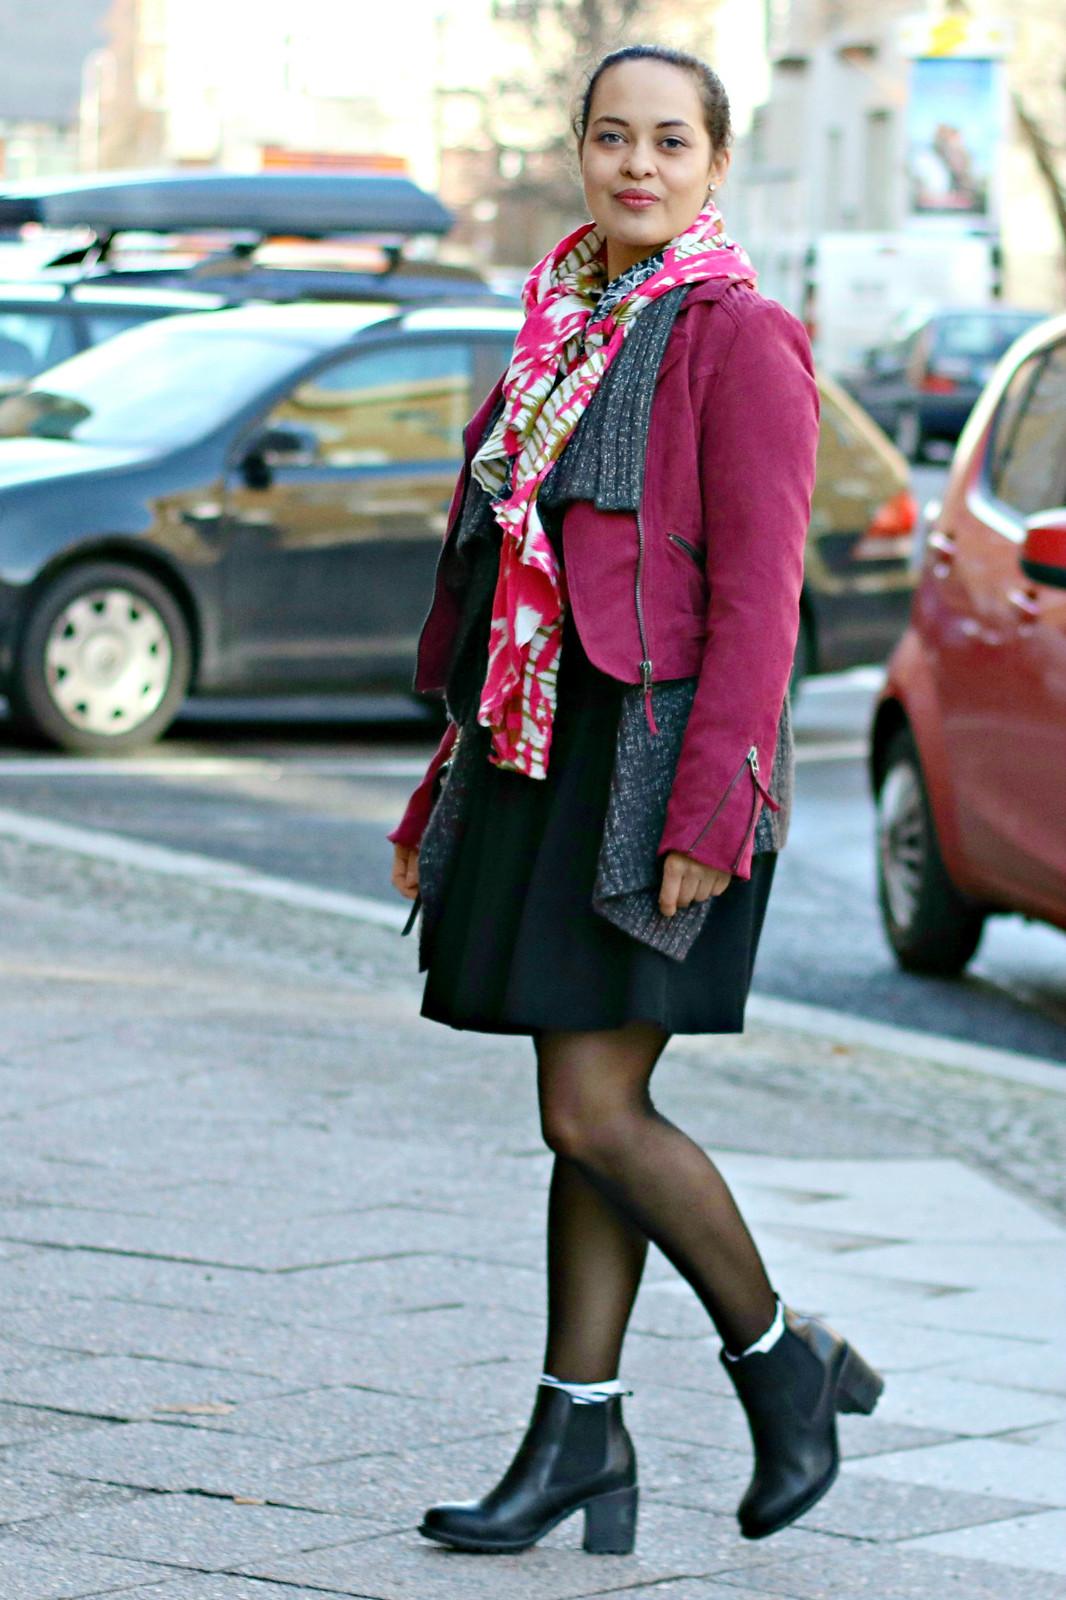 Spring Look with Moto Jacket I www.StyleByCharlotte.com